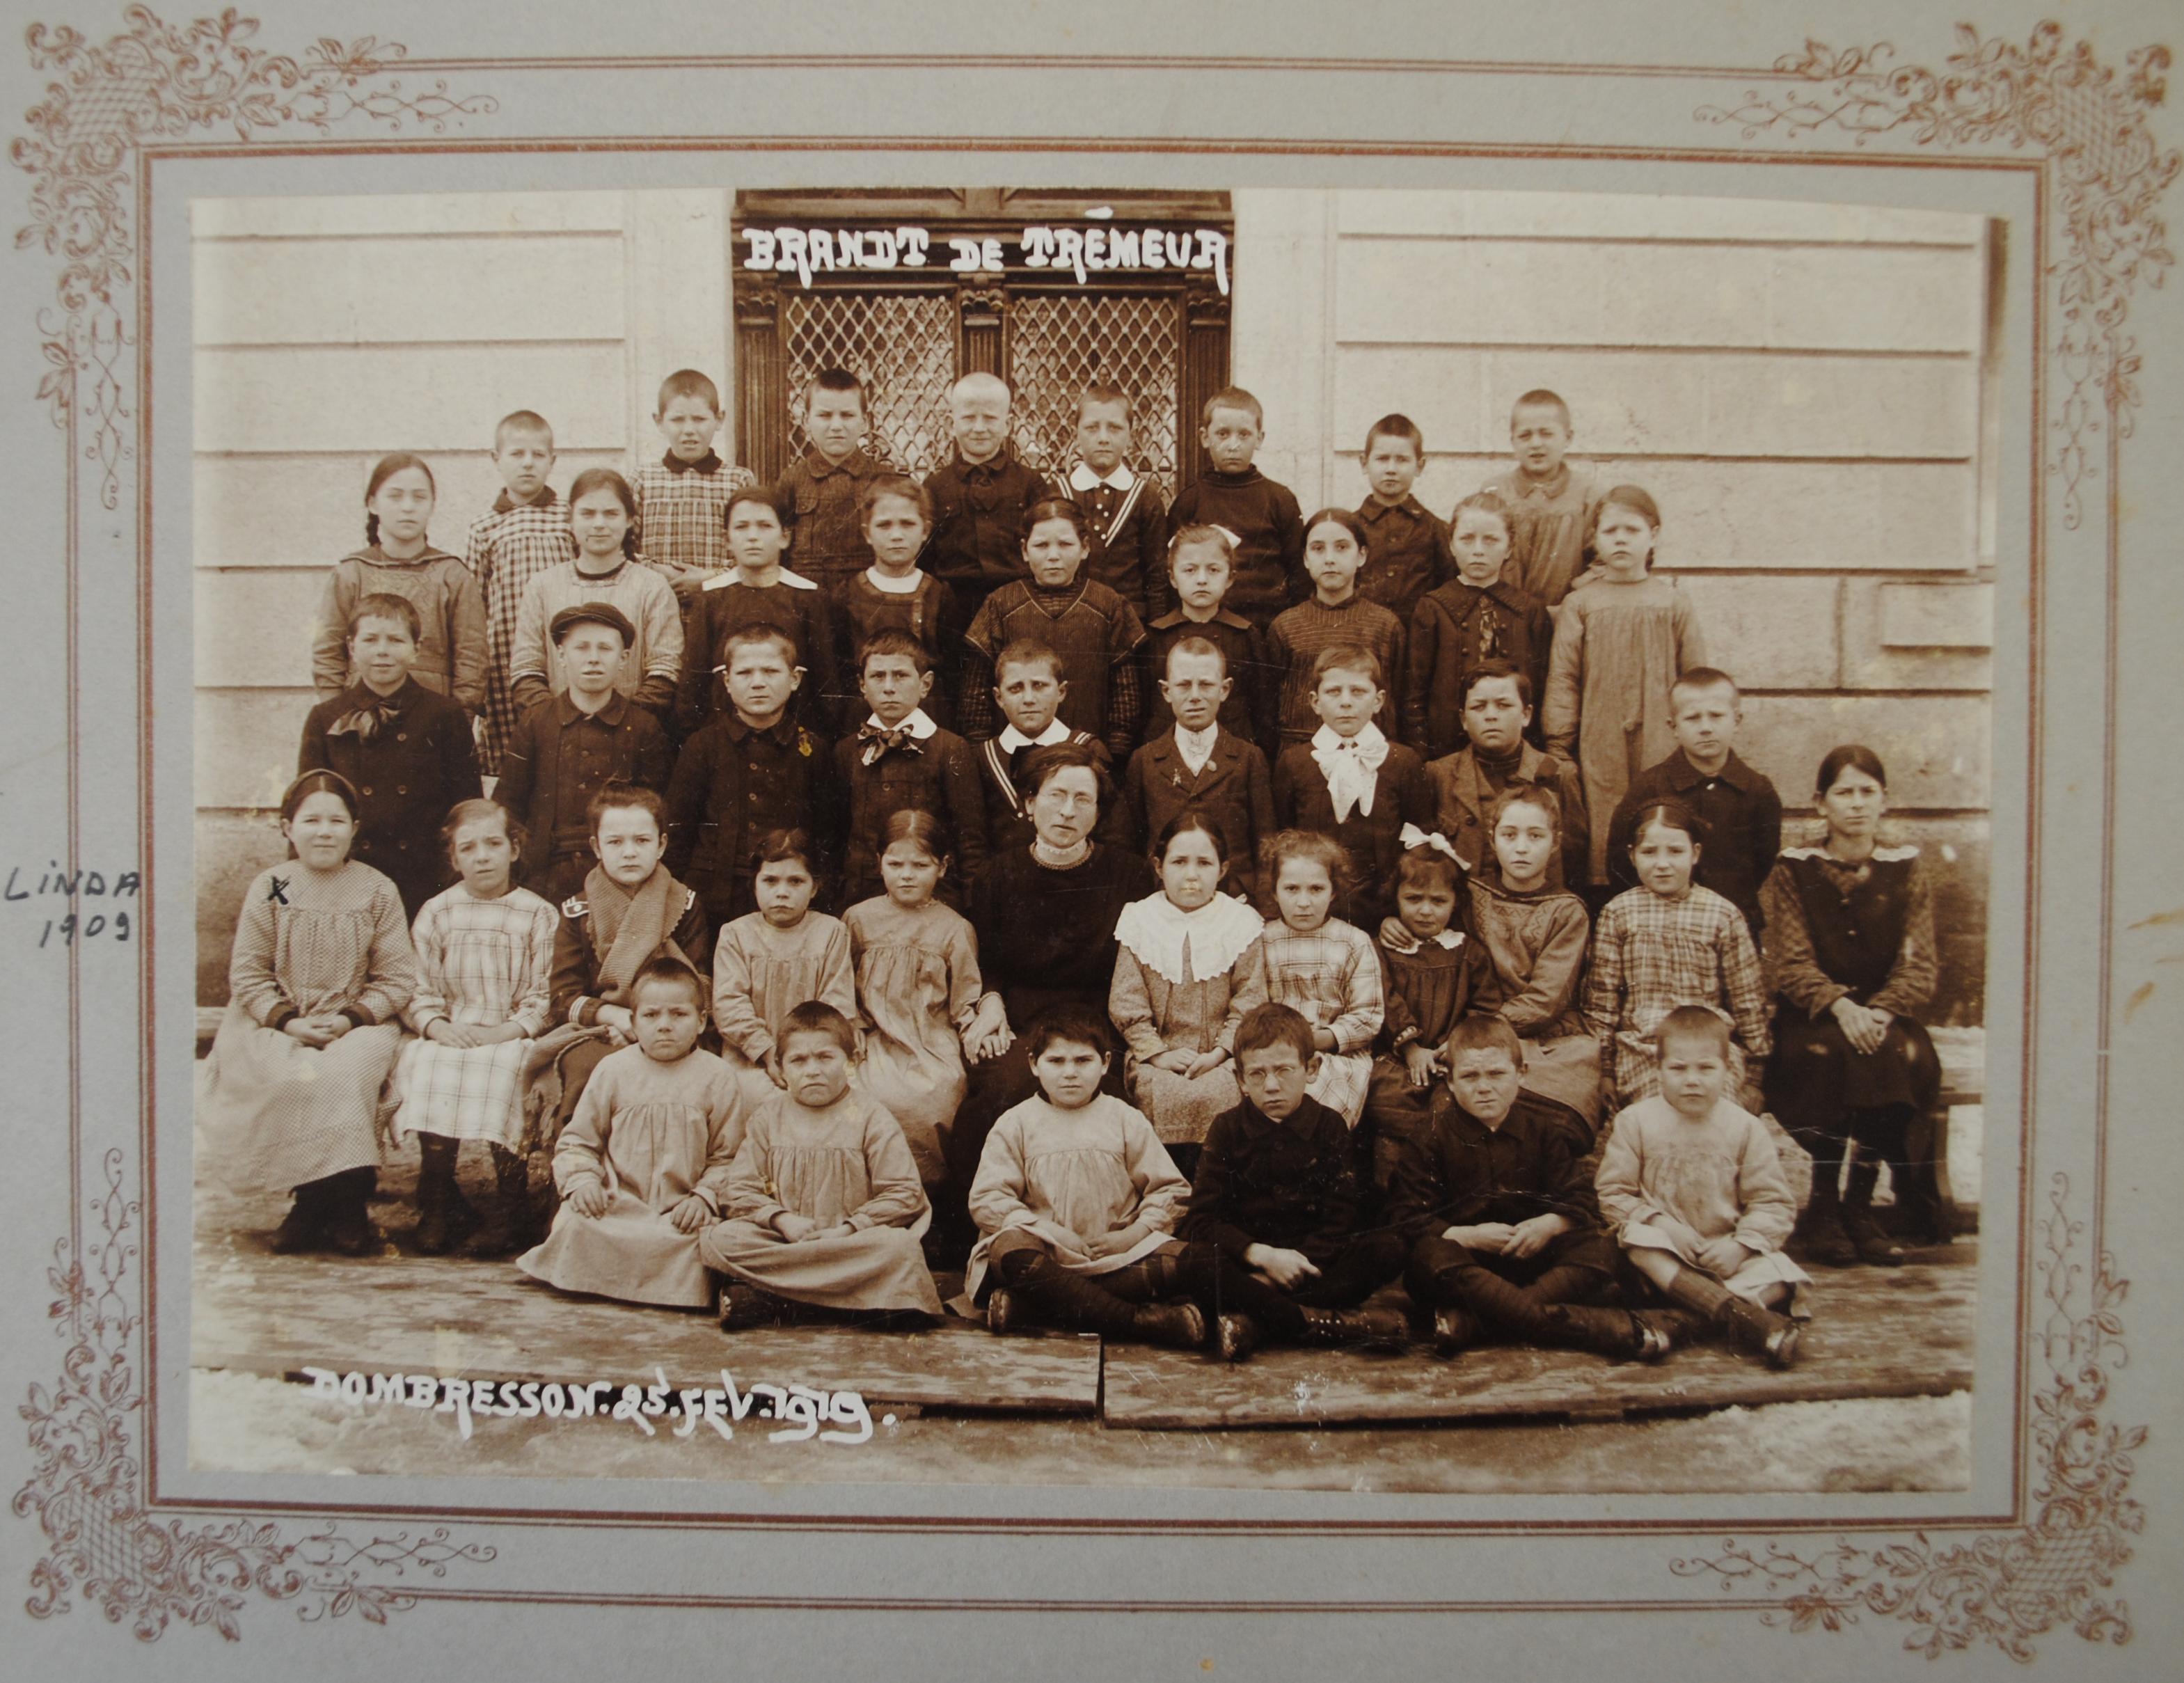 Classe de Dombresson, 1919